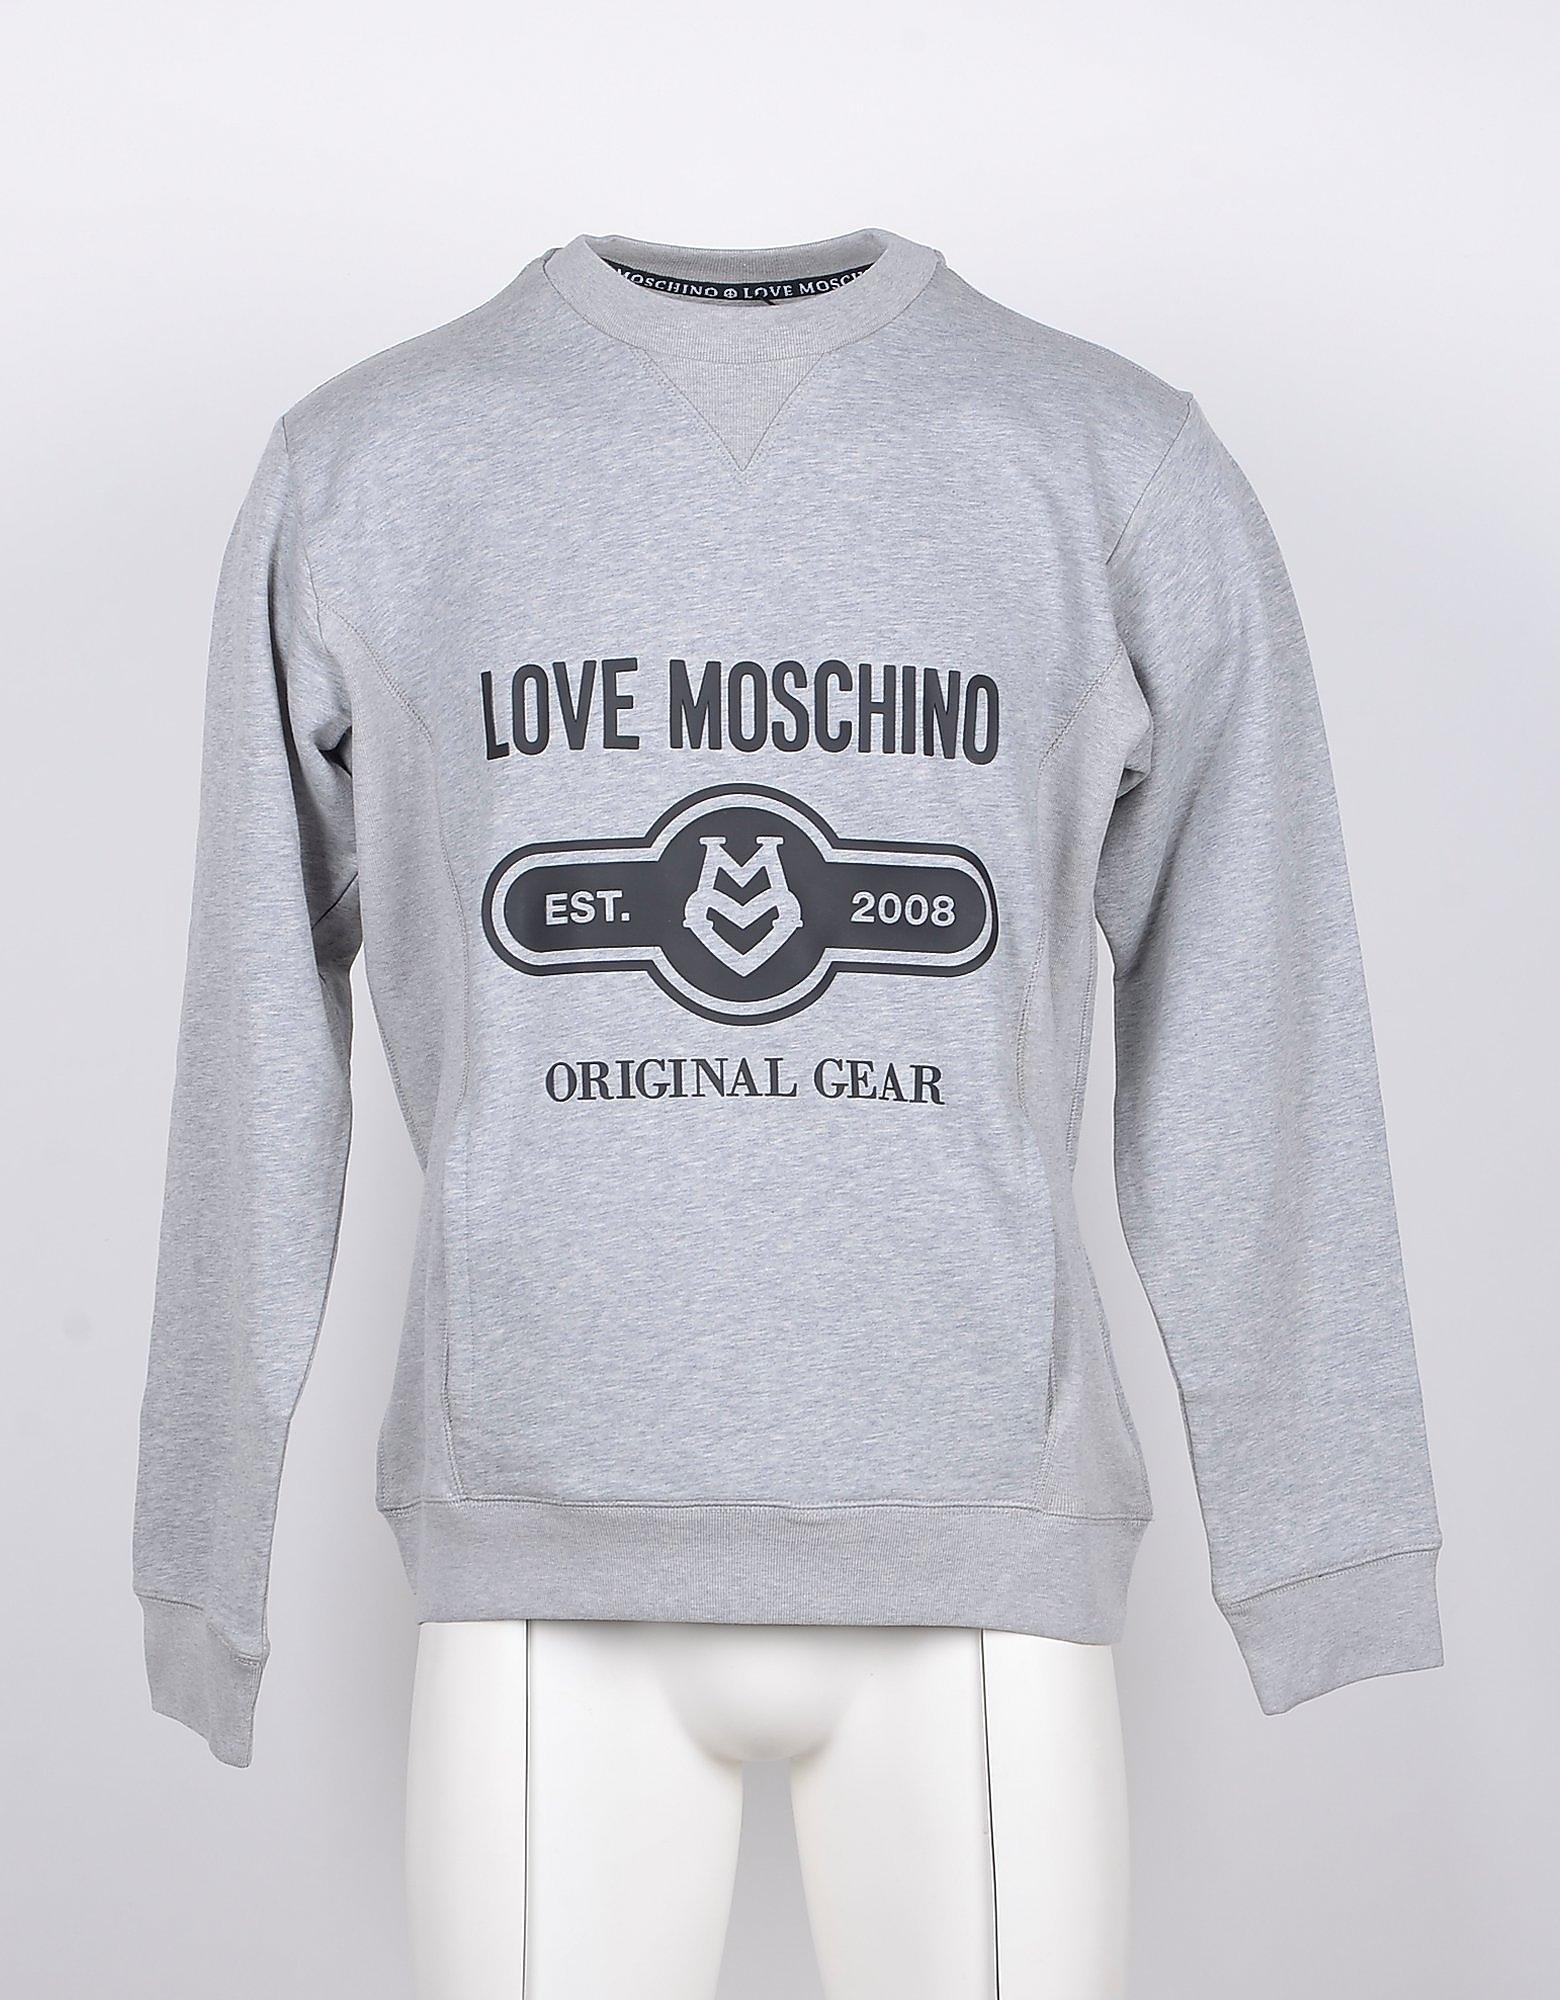 Love Moschino Designer Sweatshirts, Signature Print Melange Gray Cotton Sweatshirt